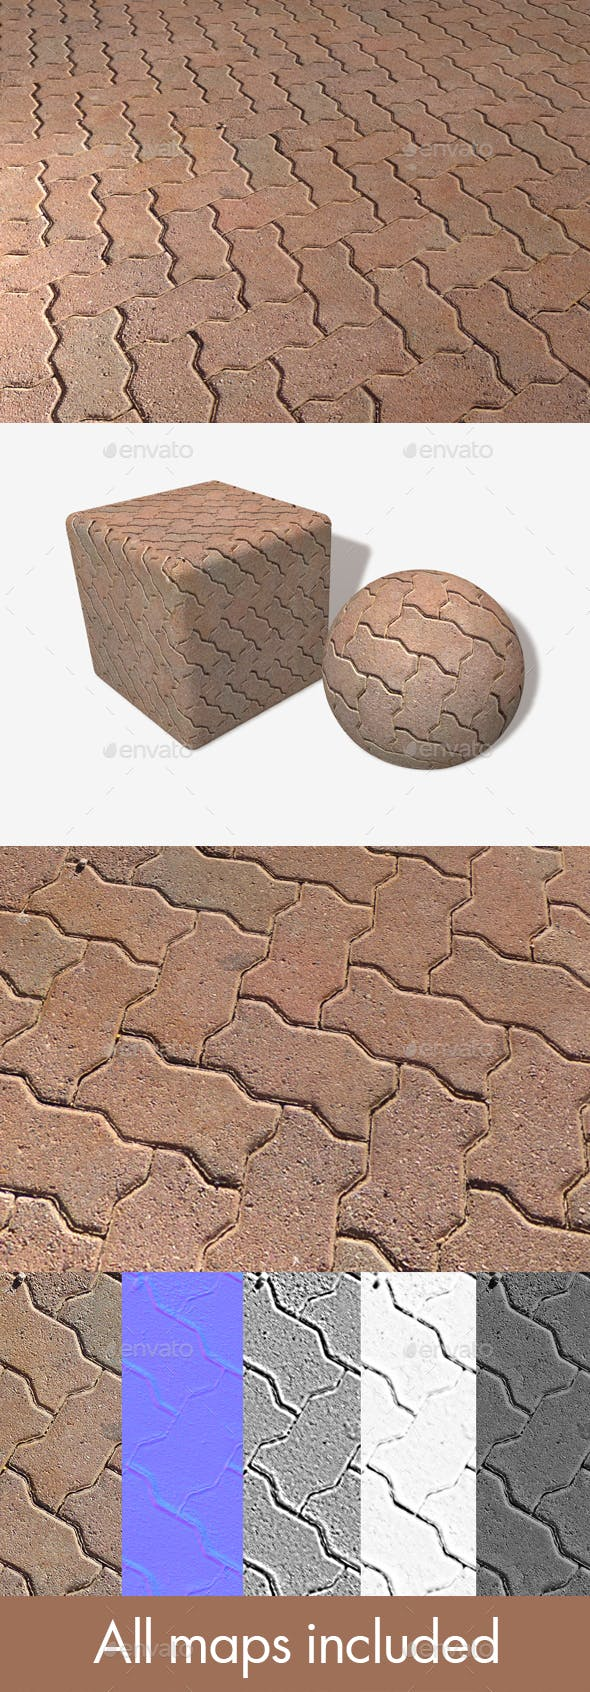 Zig Zag Paving Bricks Seamless Texture - 3DOcean Item for Sale